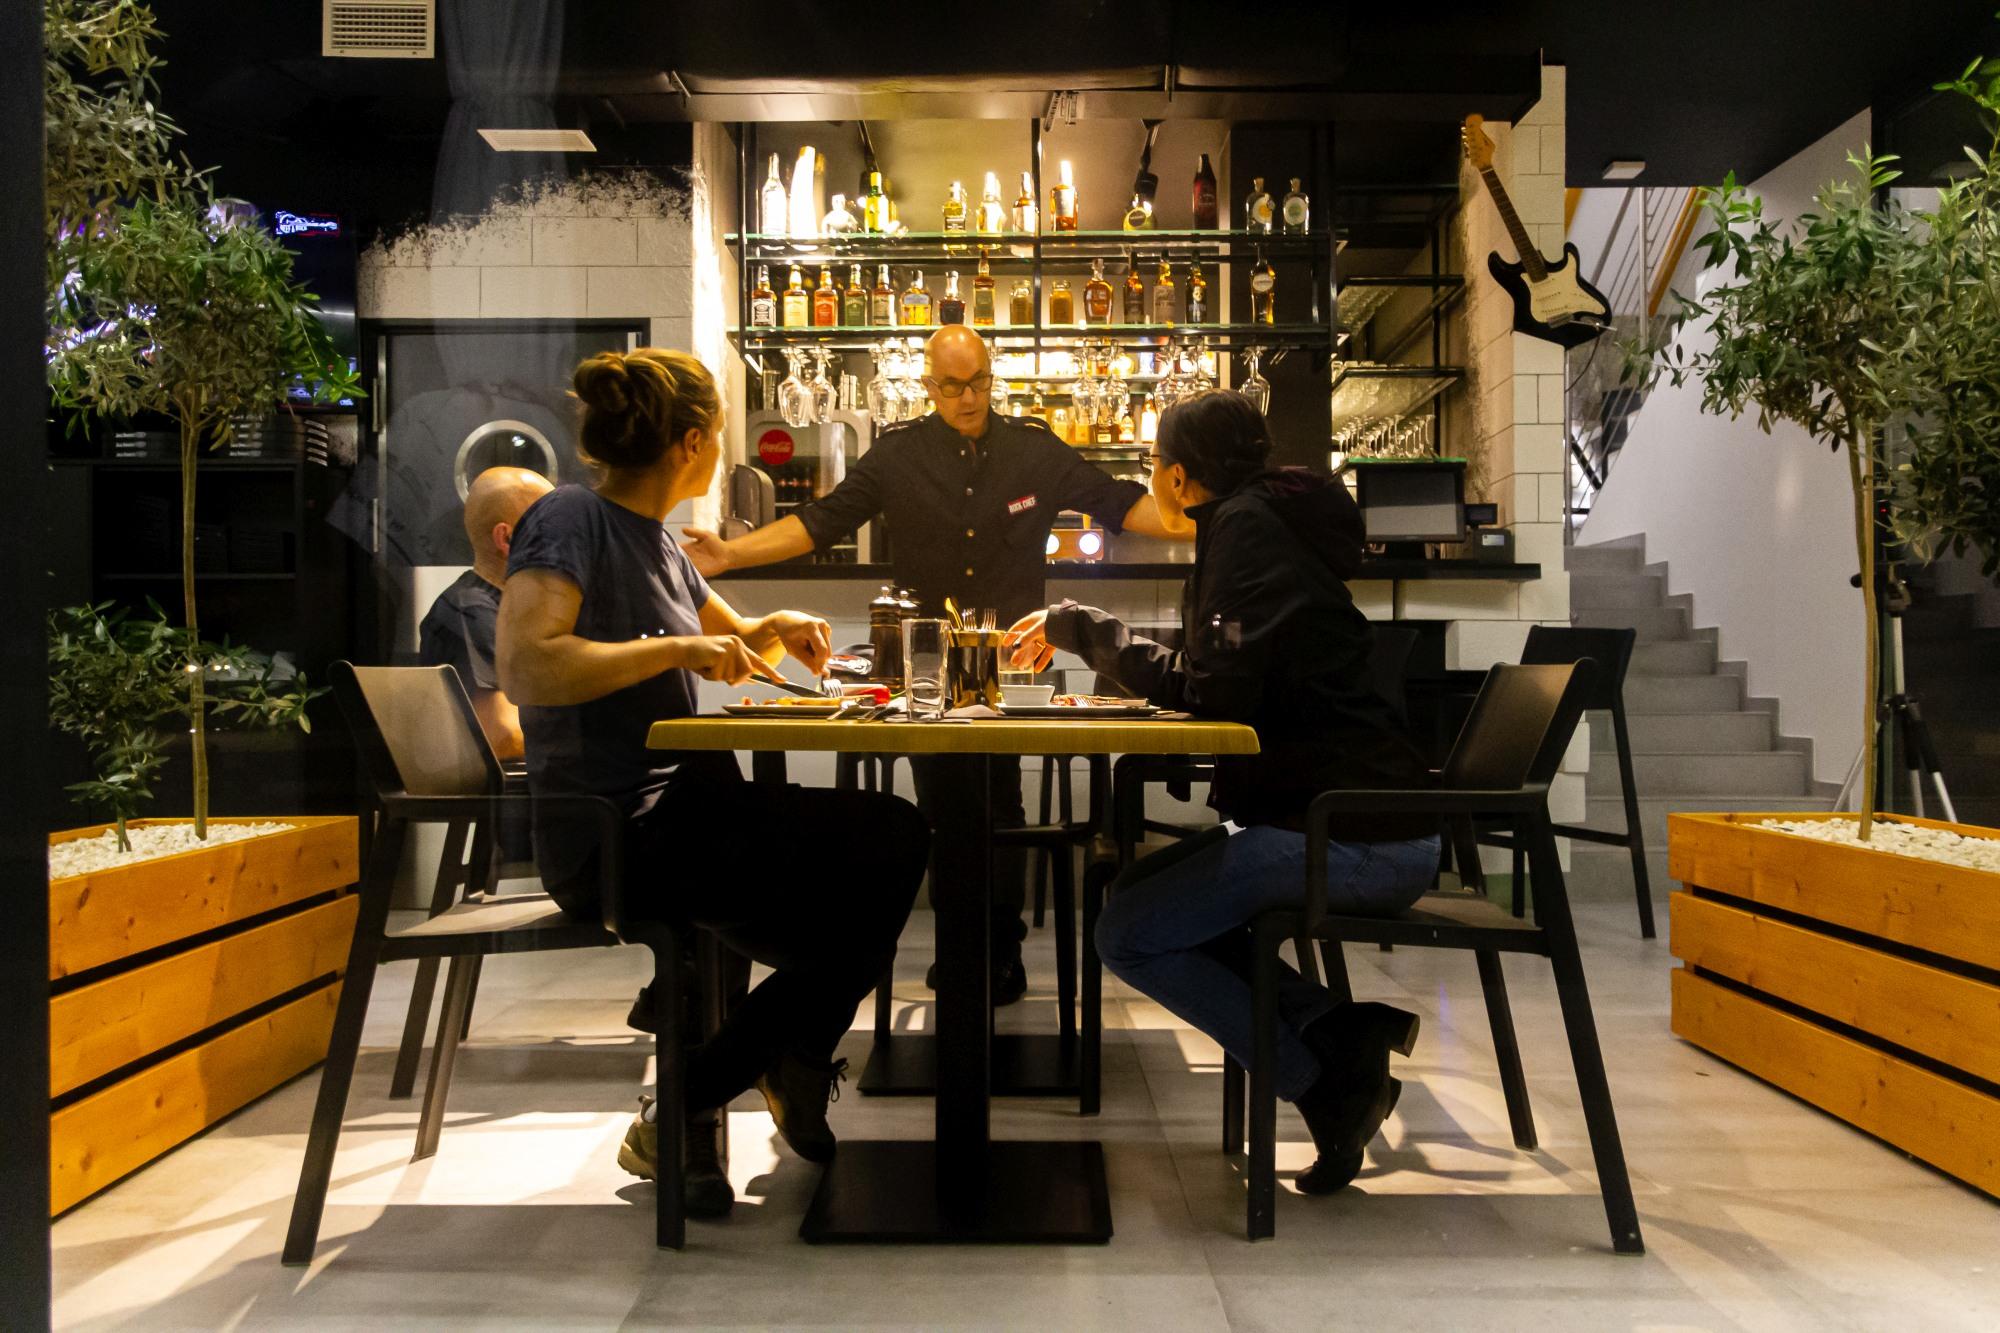 Beef and Rock - steak house i restauracja w Karpaczu